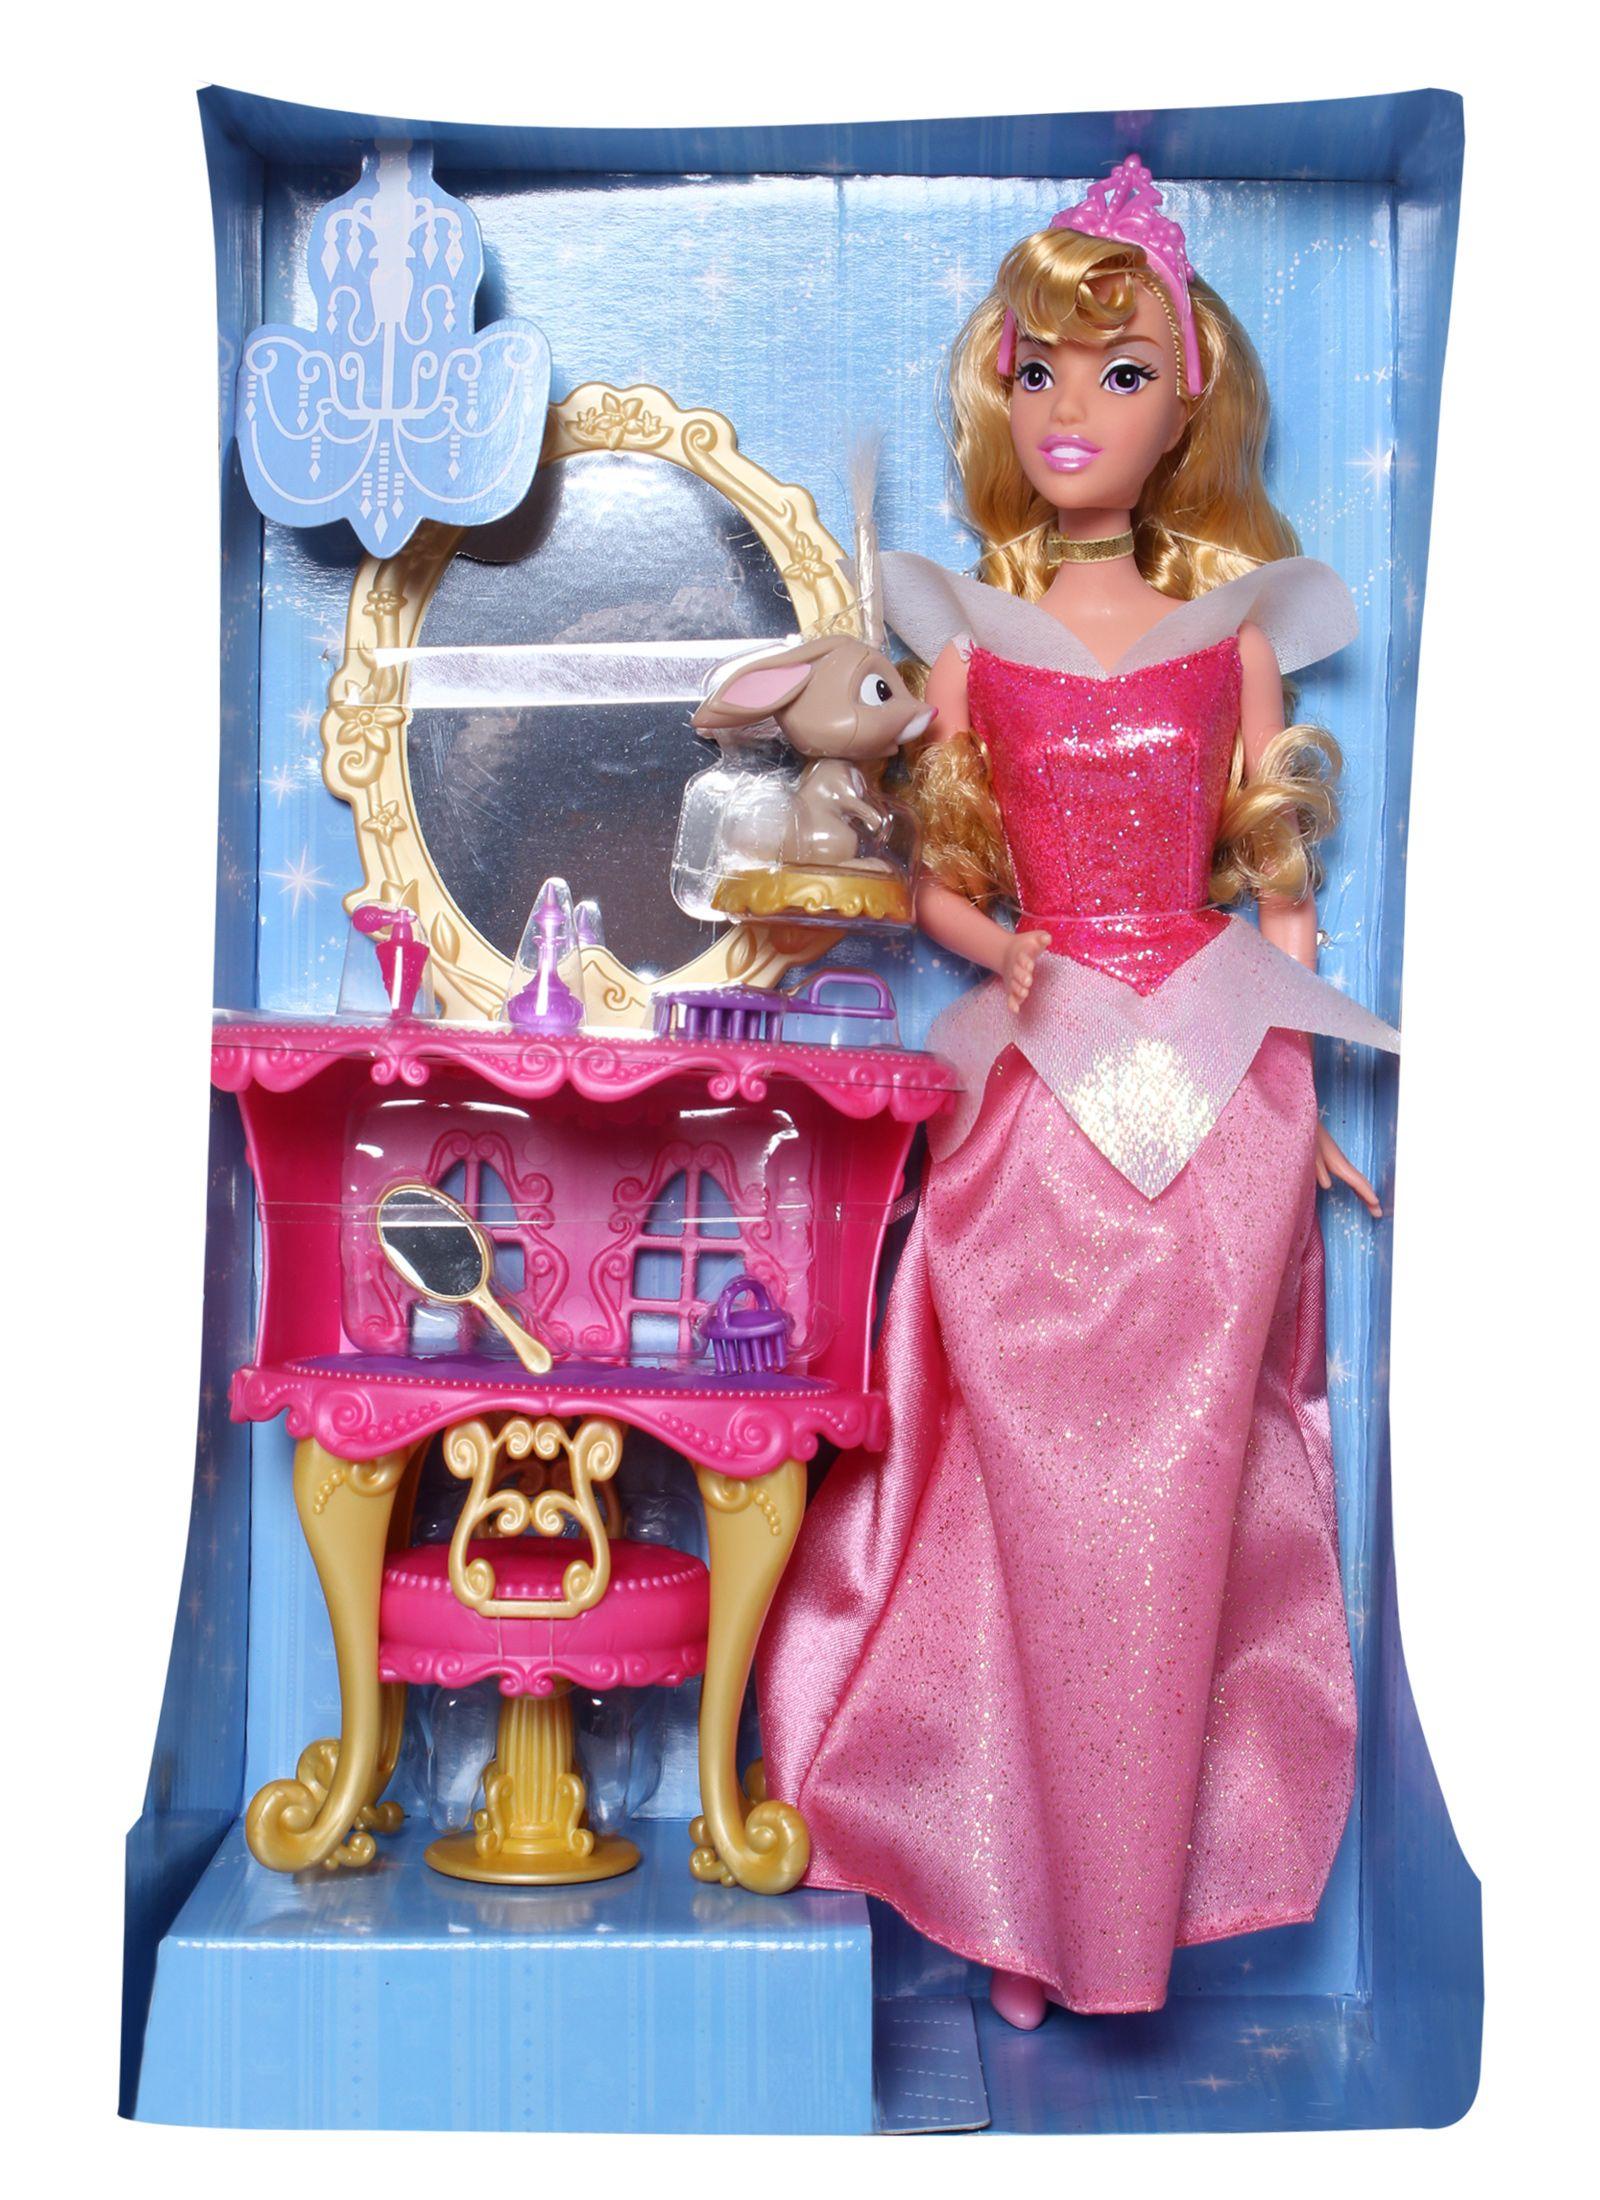 Disney princess aurora sleeping beauty online india buy dolls and